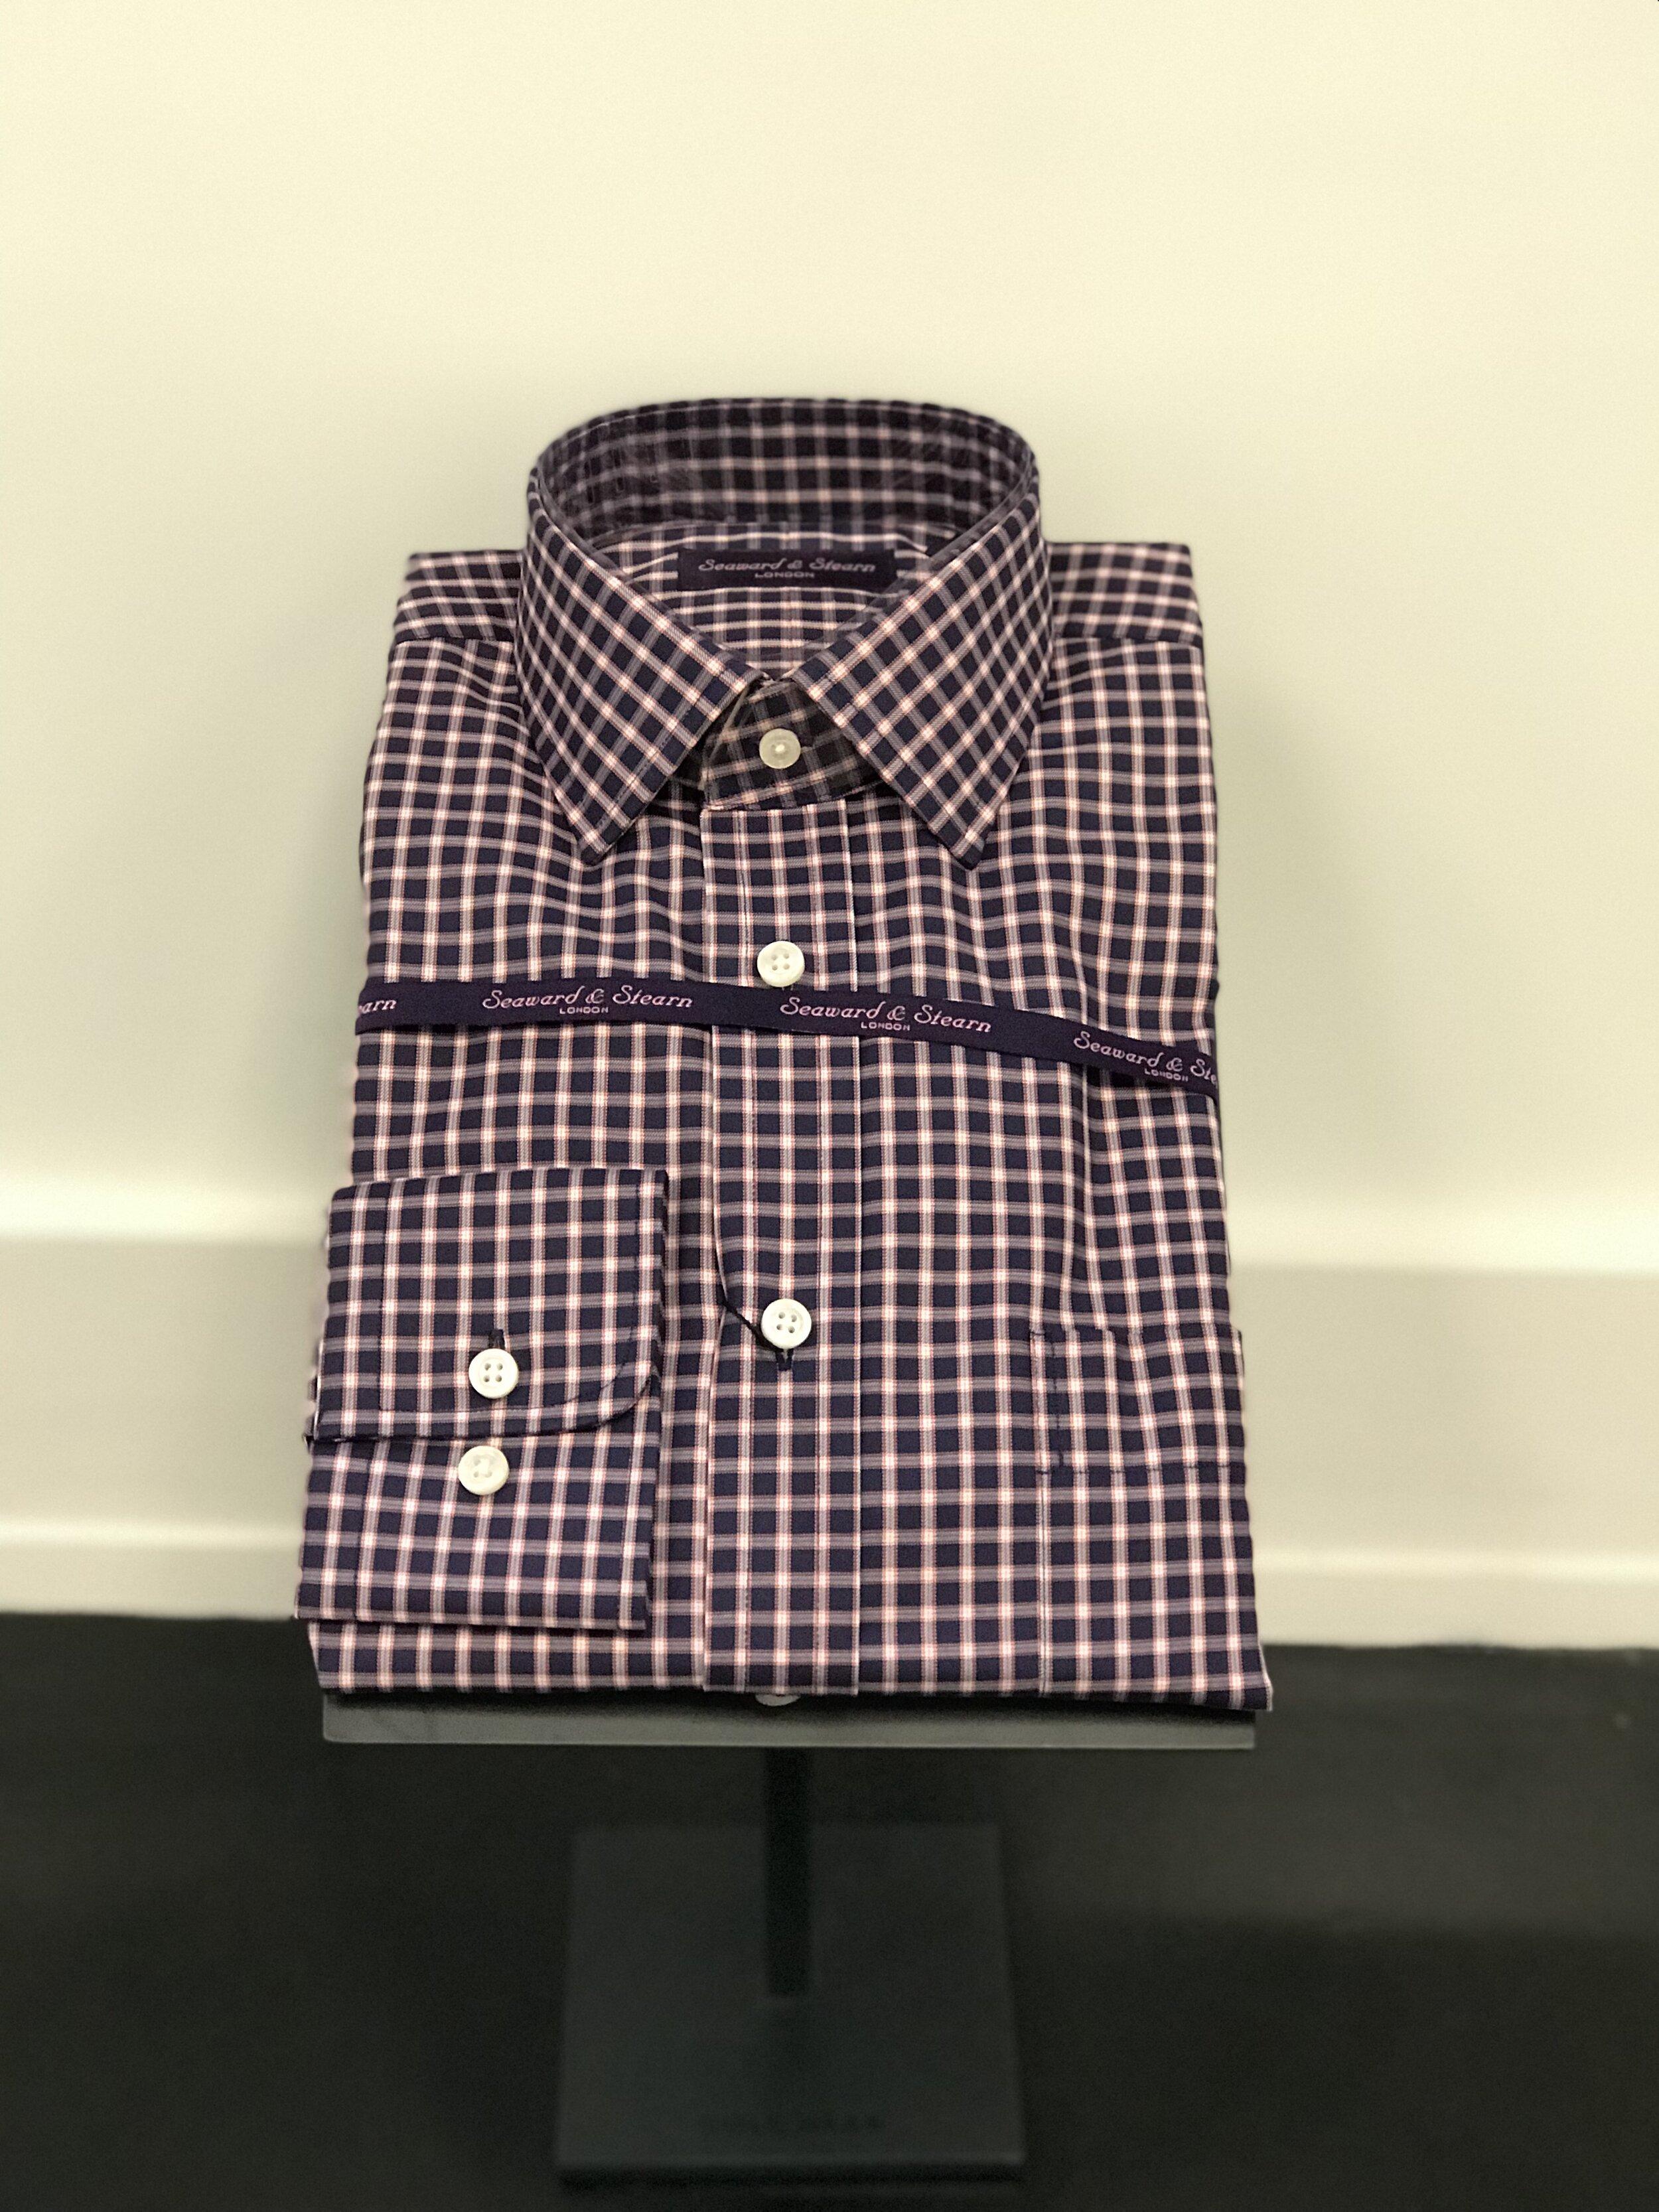 Button Down Collar Purple Gingham Shirt by Seaward & Stearn